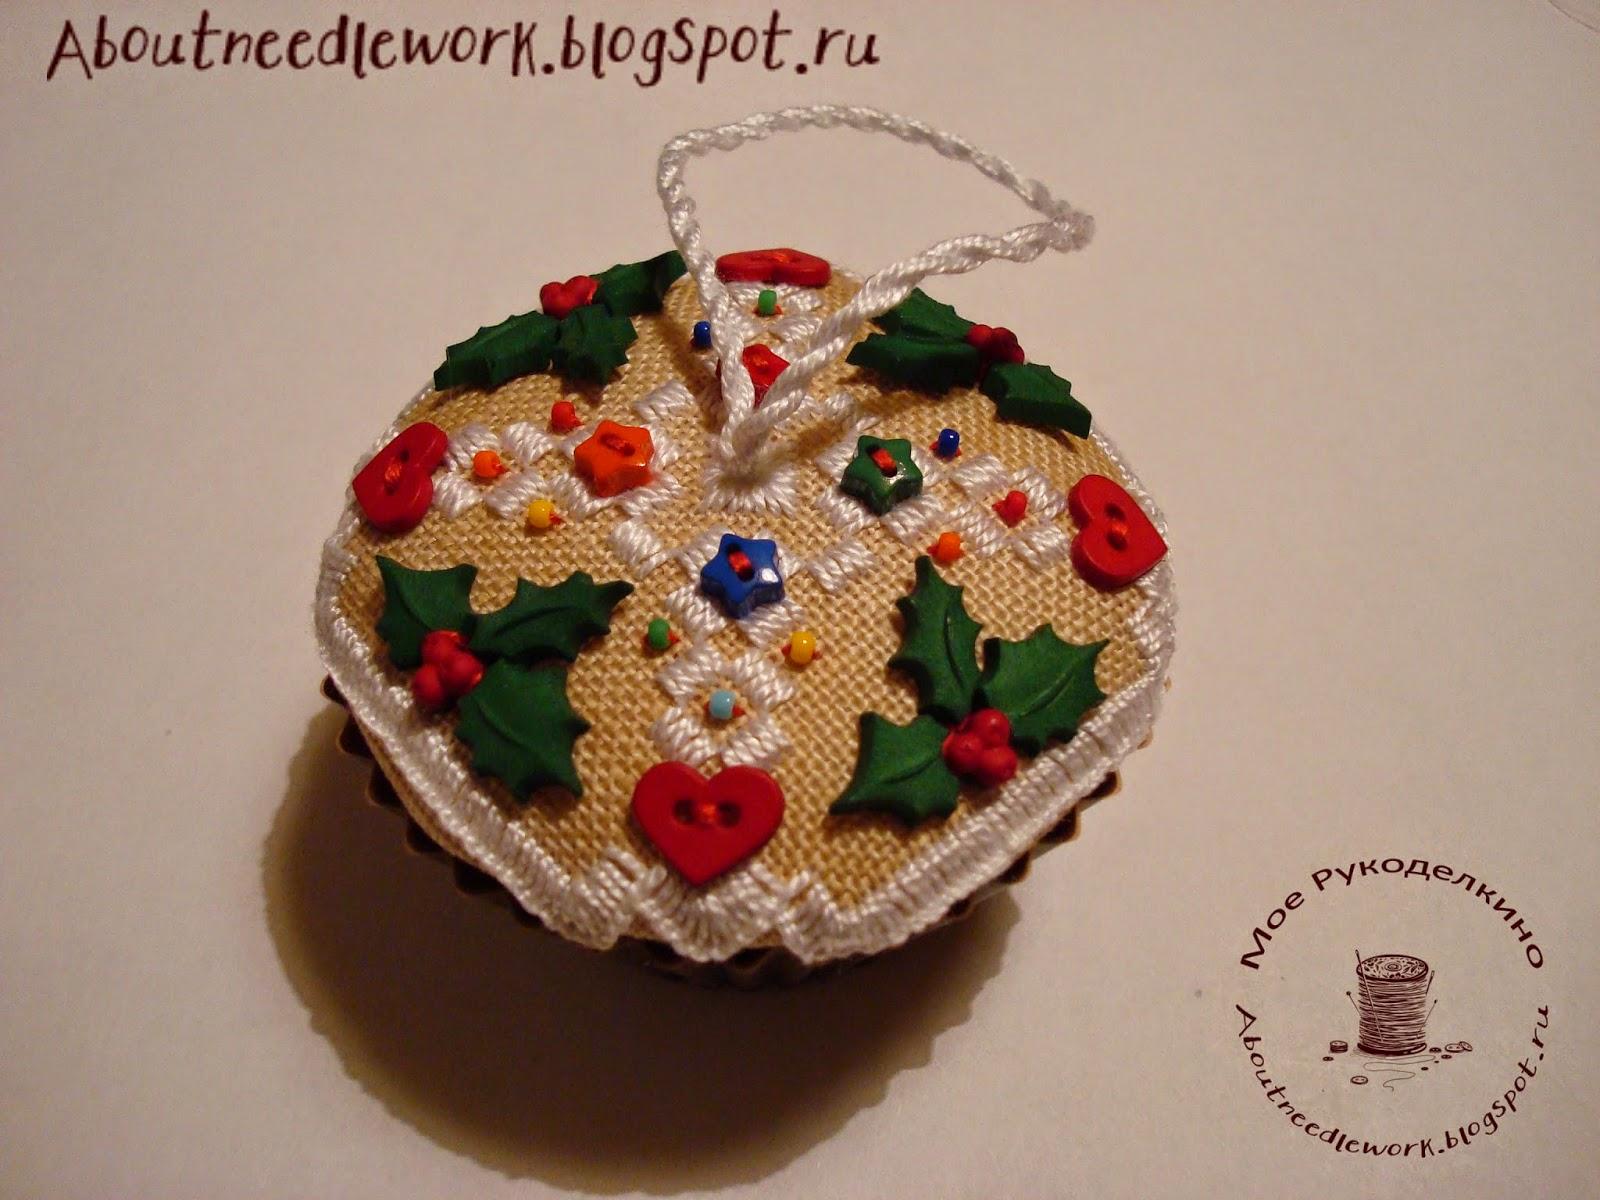 The Victoria Sampler кексы вышивка